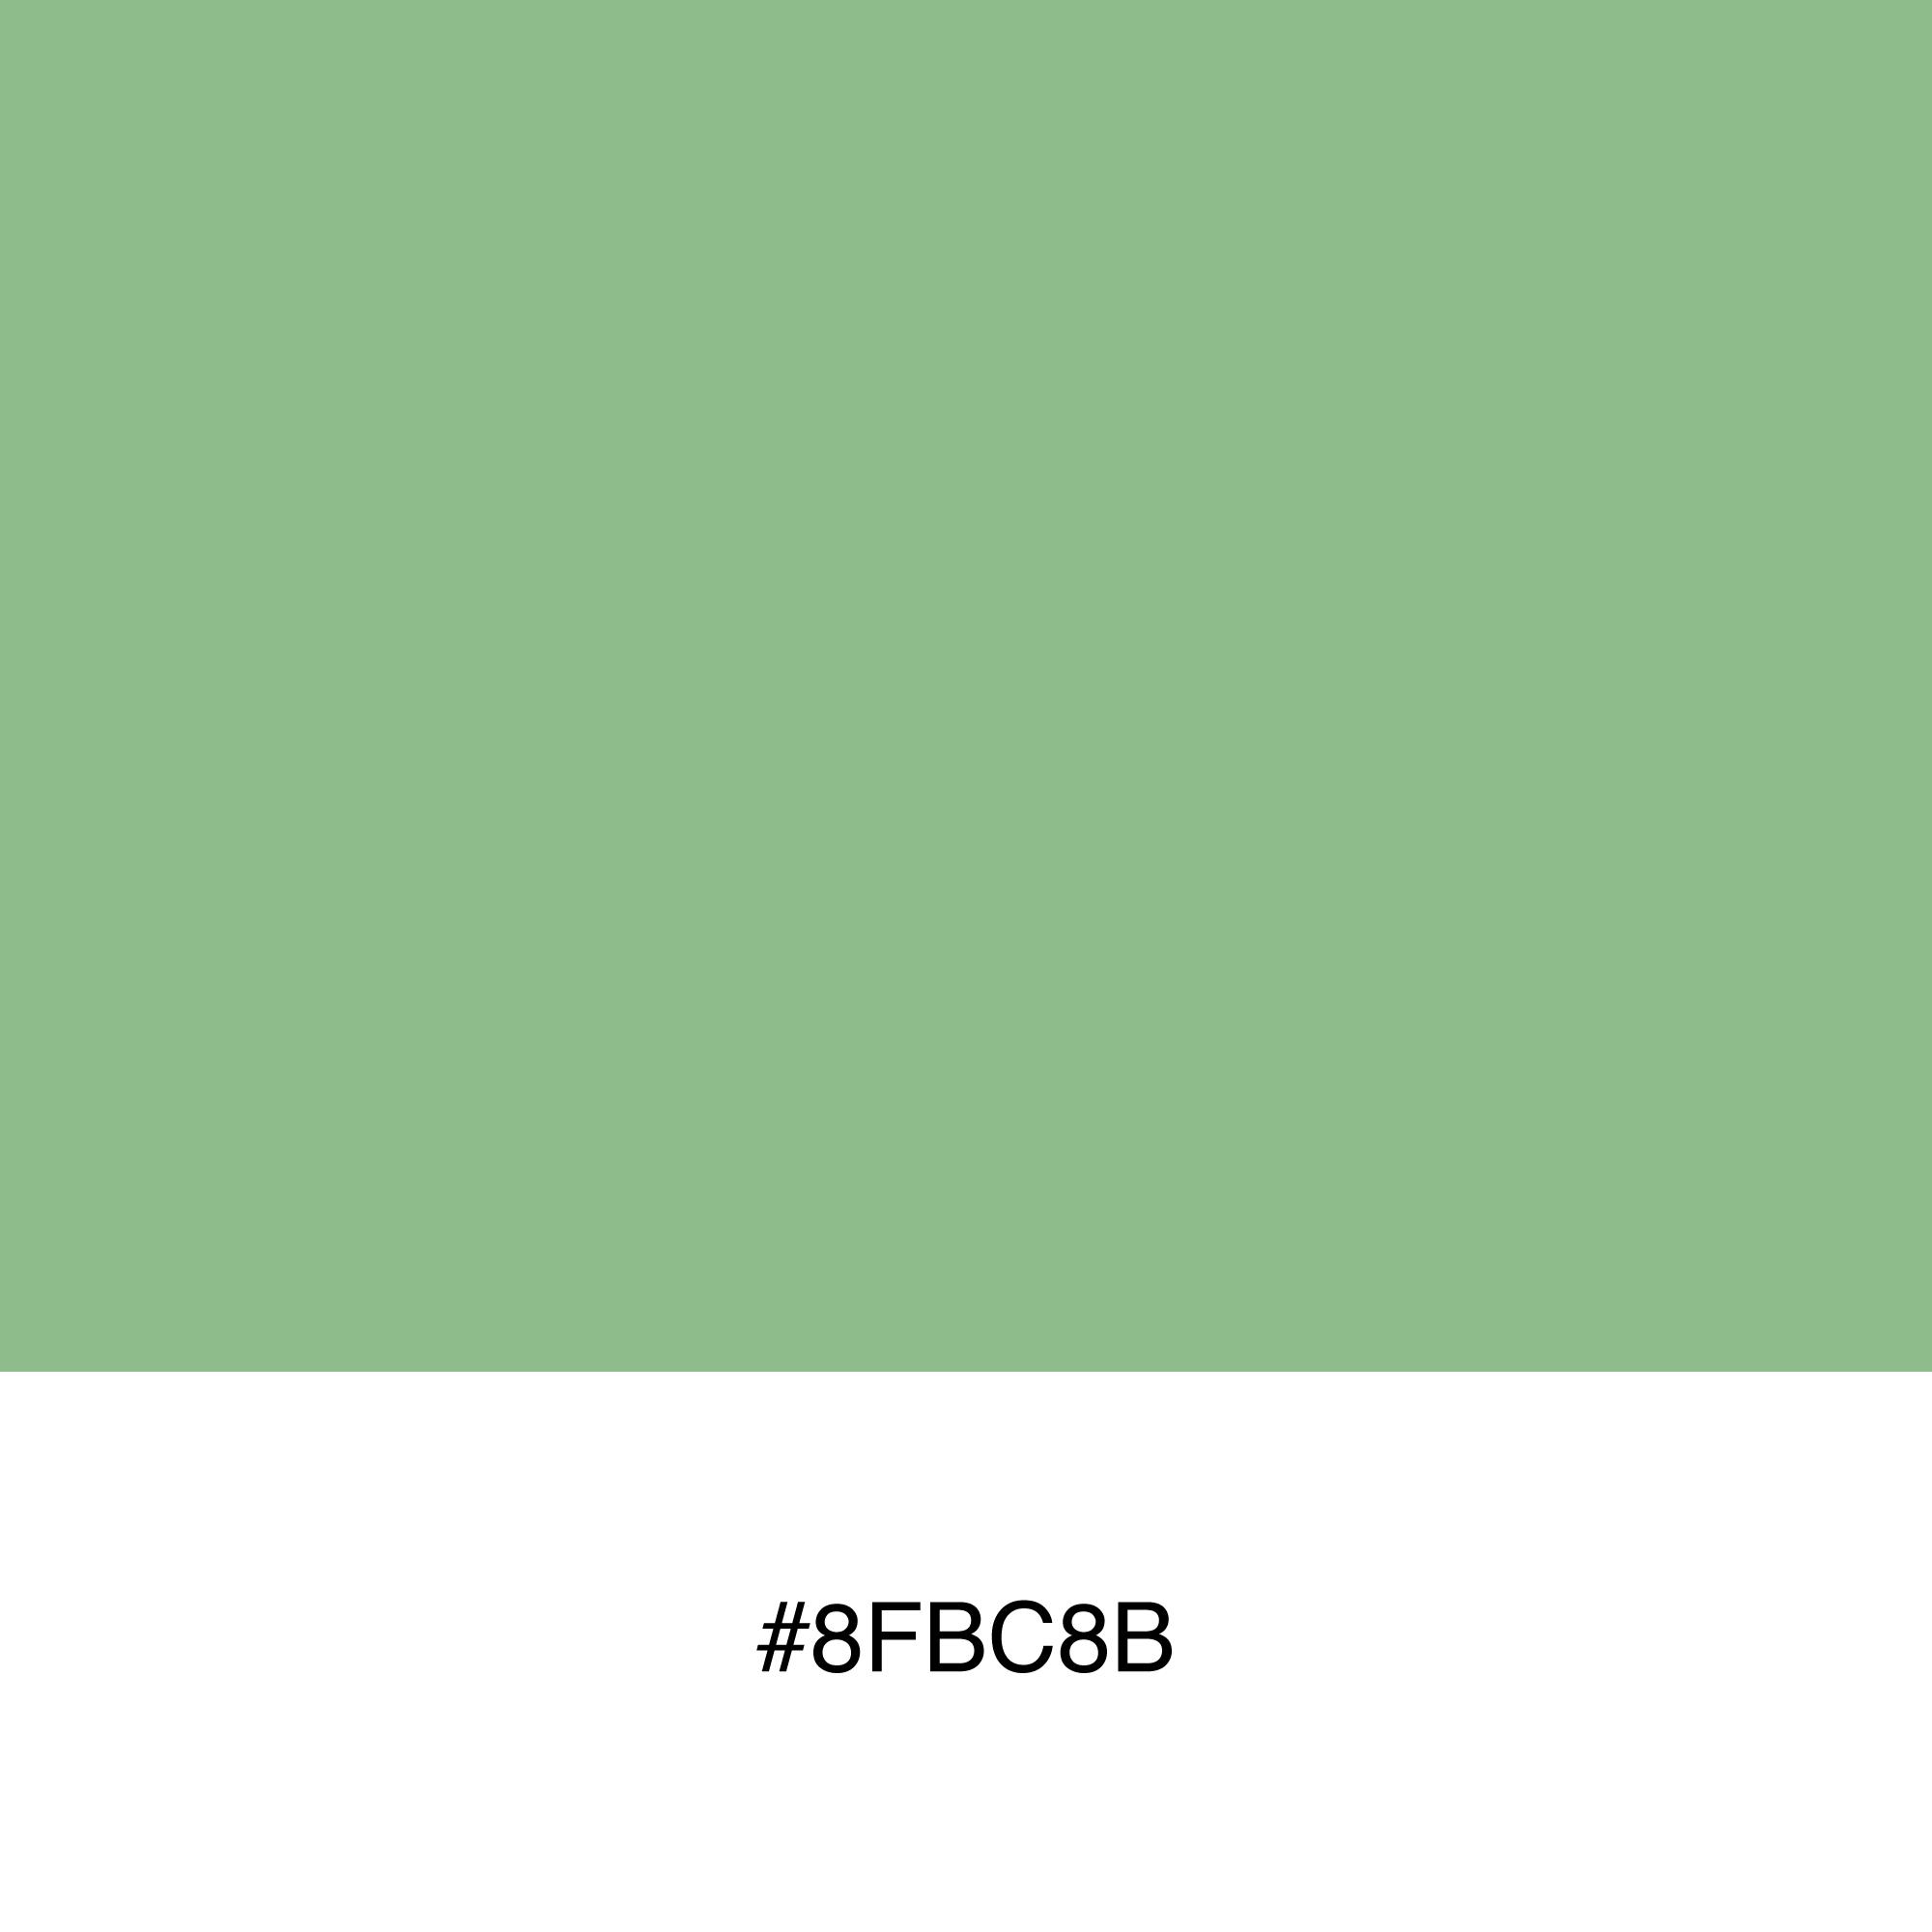 color-swatch-8fbc8b